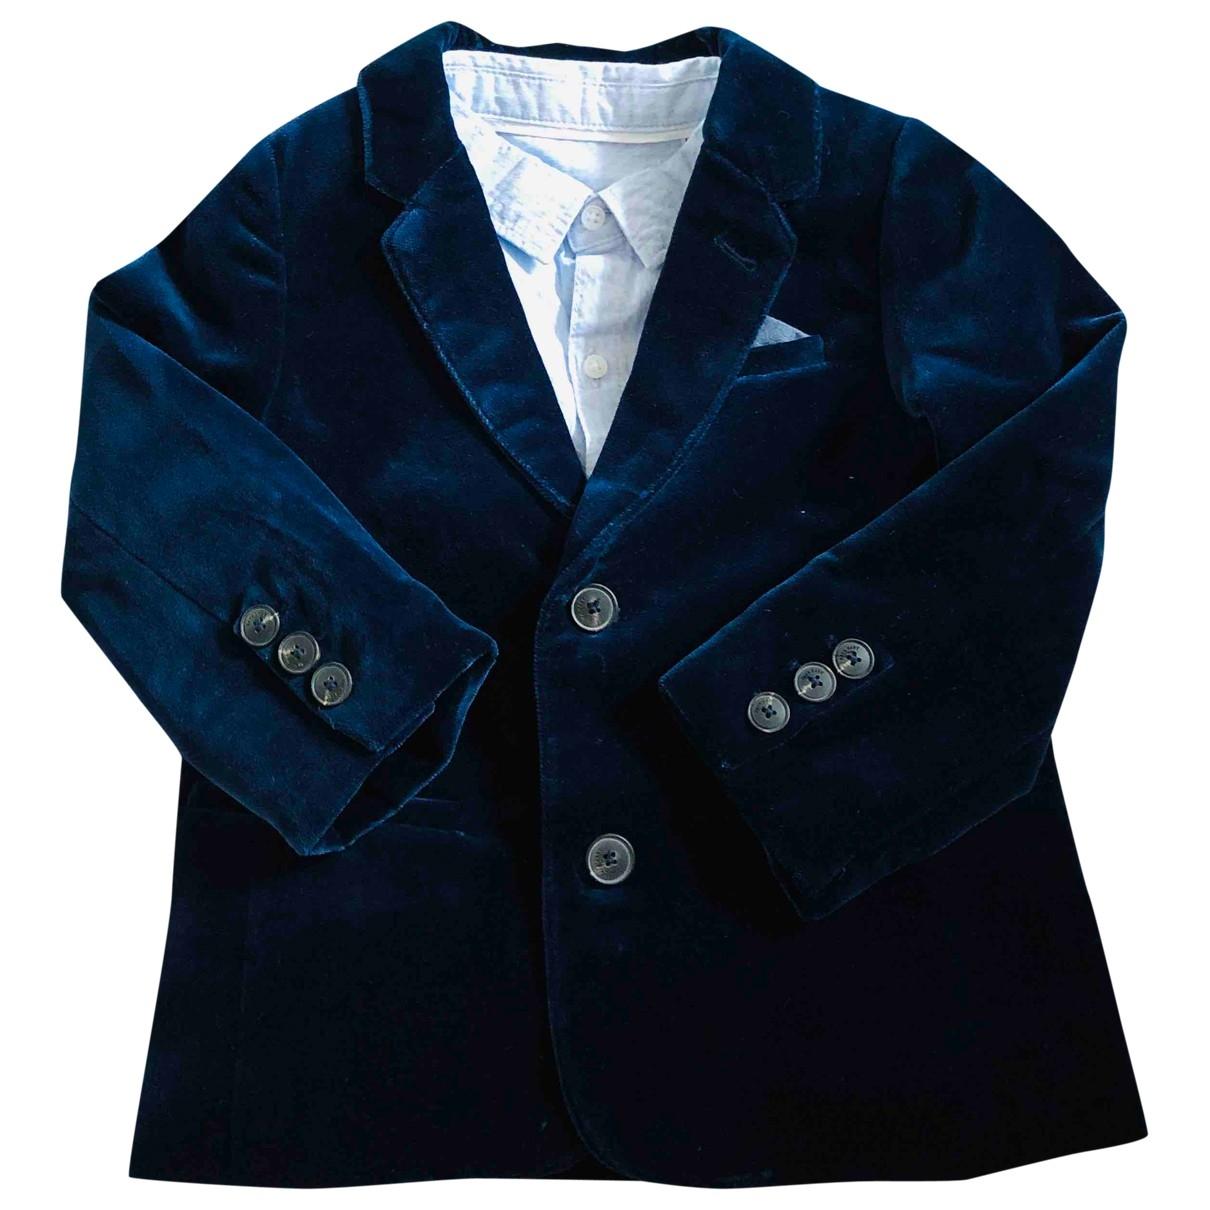 Zara \N Blue Velvet Outfits for Kids 2 years - up to 86cm FR